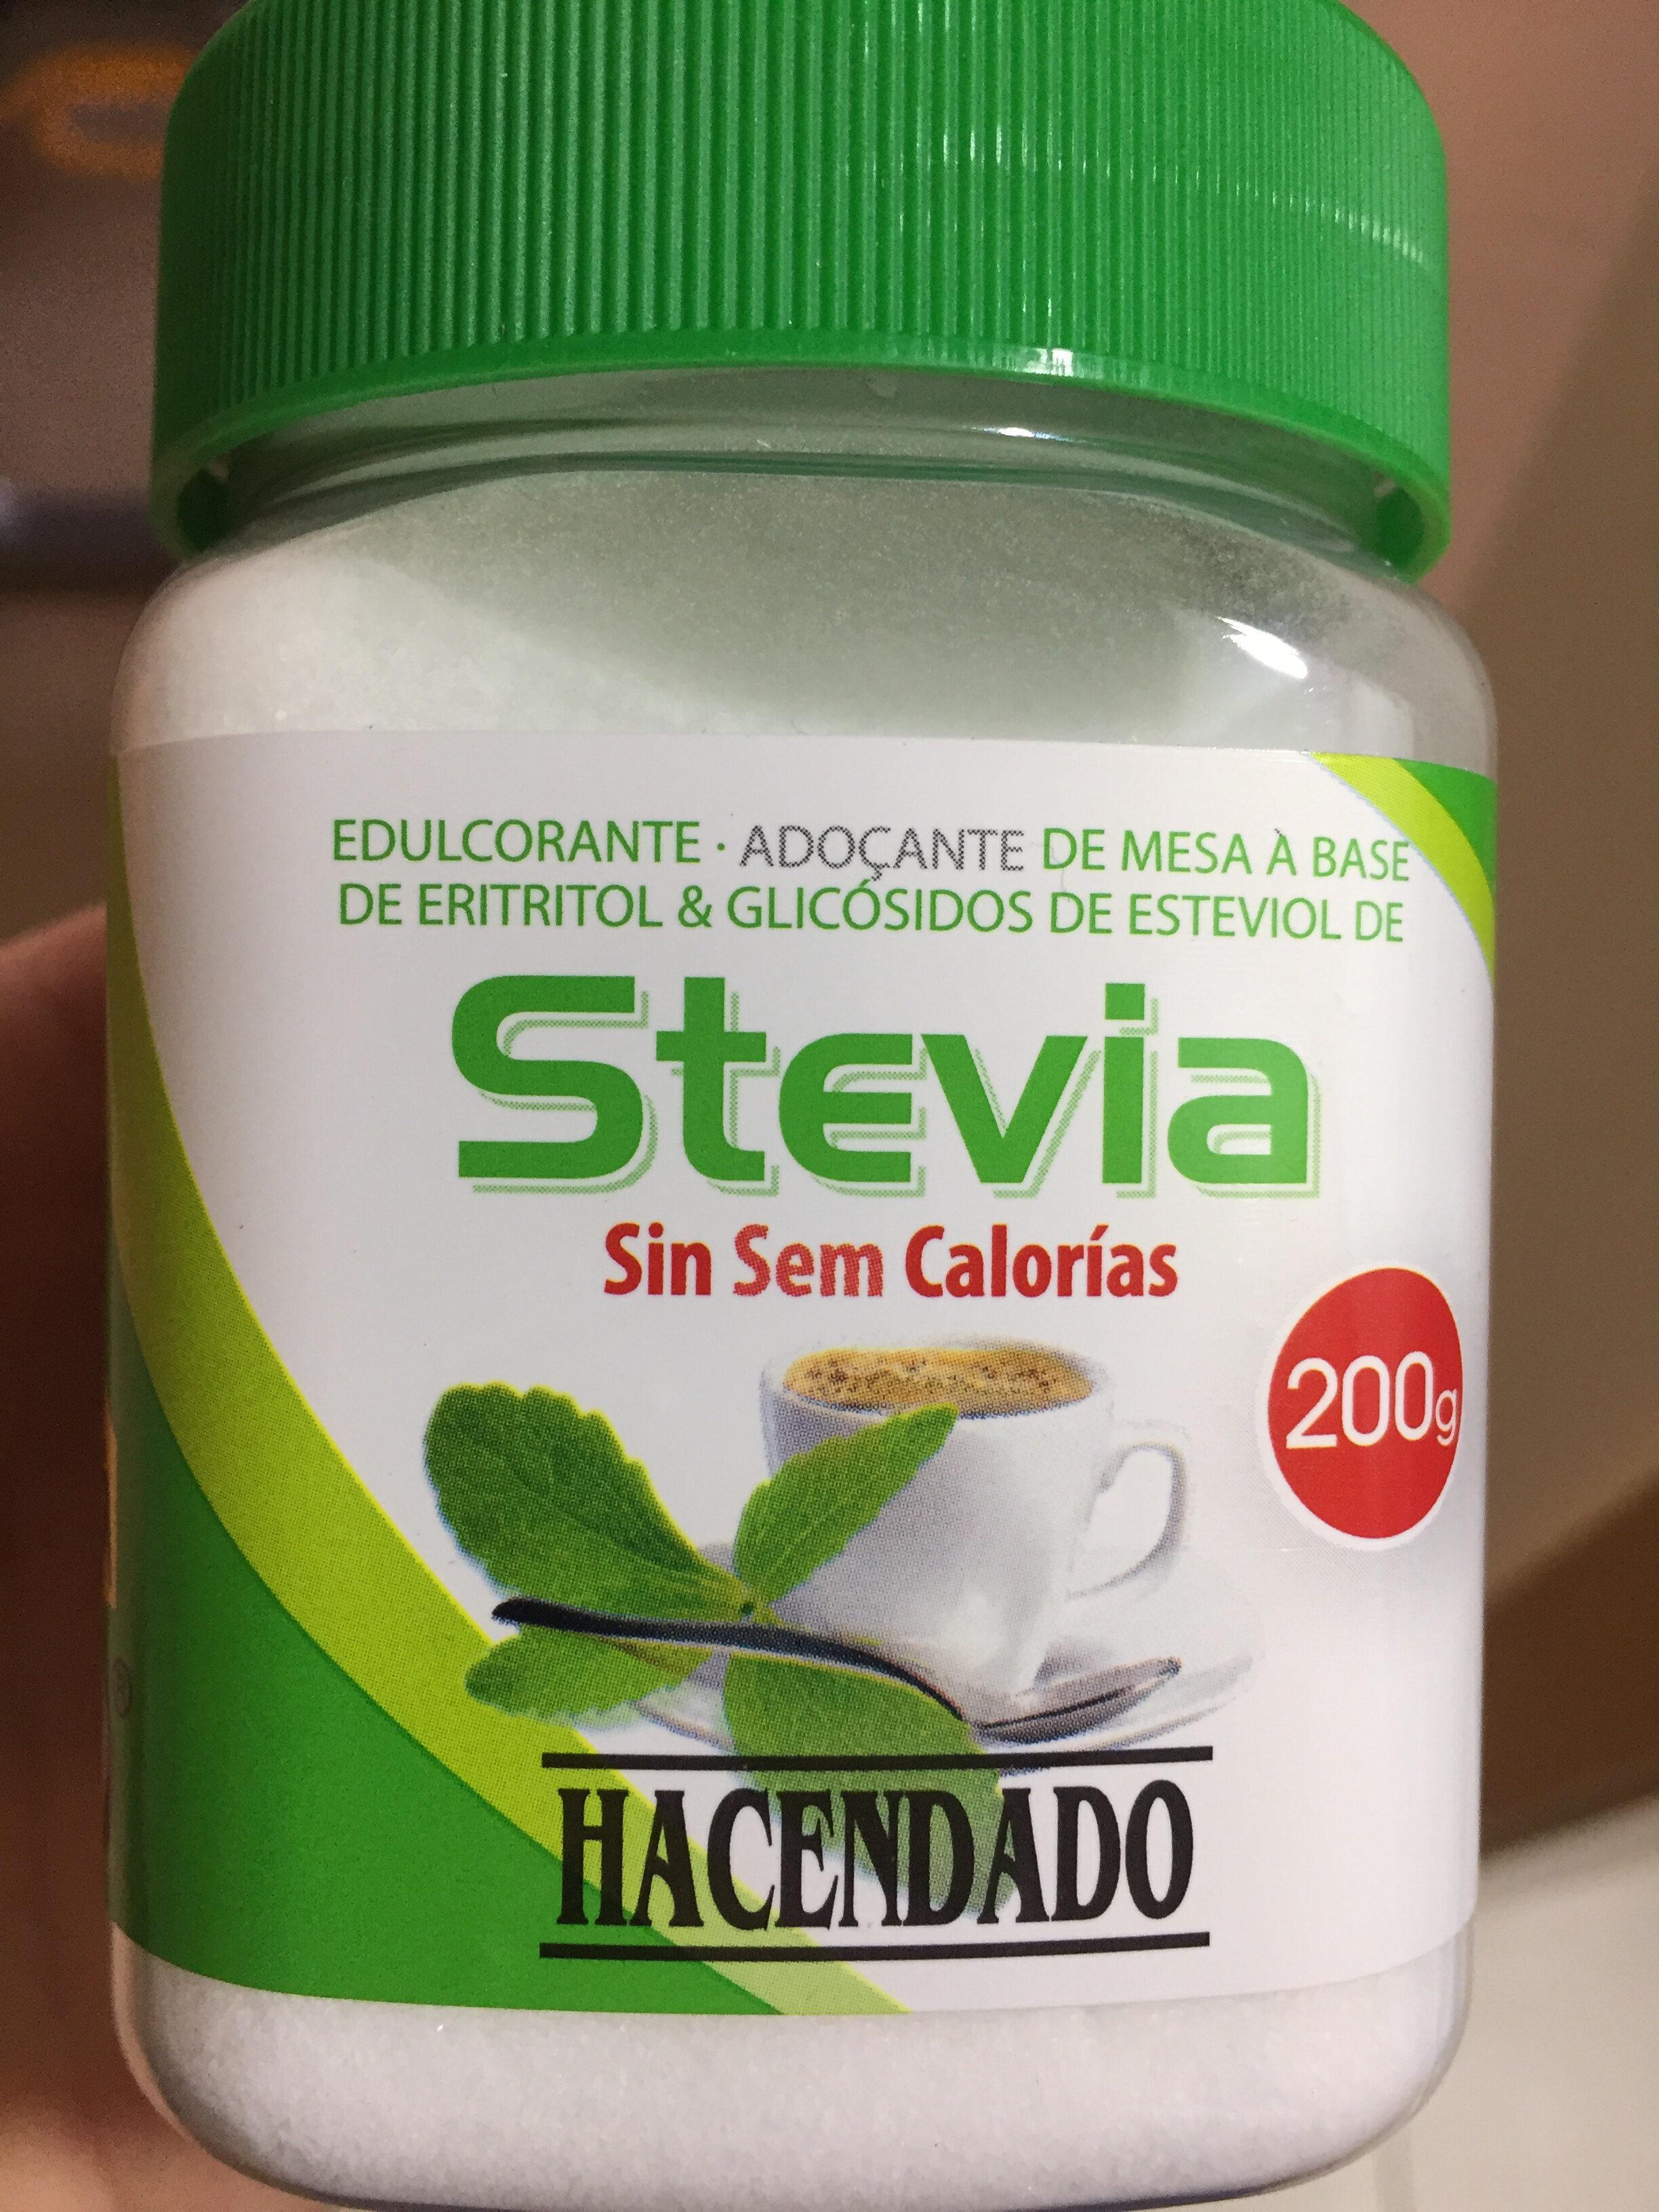 Stevia - Product - en